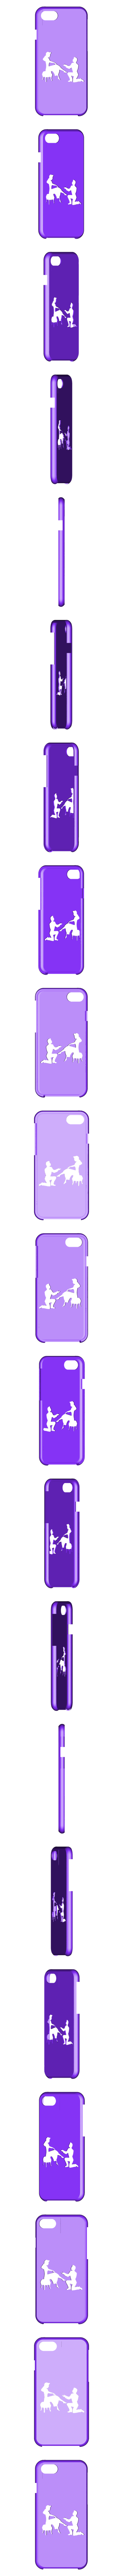 Iphone_7_cenerentola.stl Download STL file Iphone 7 Cinderella cover • 3D printer object, Arge89